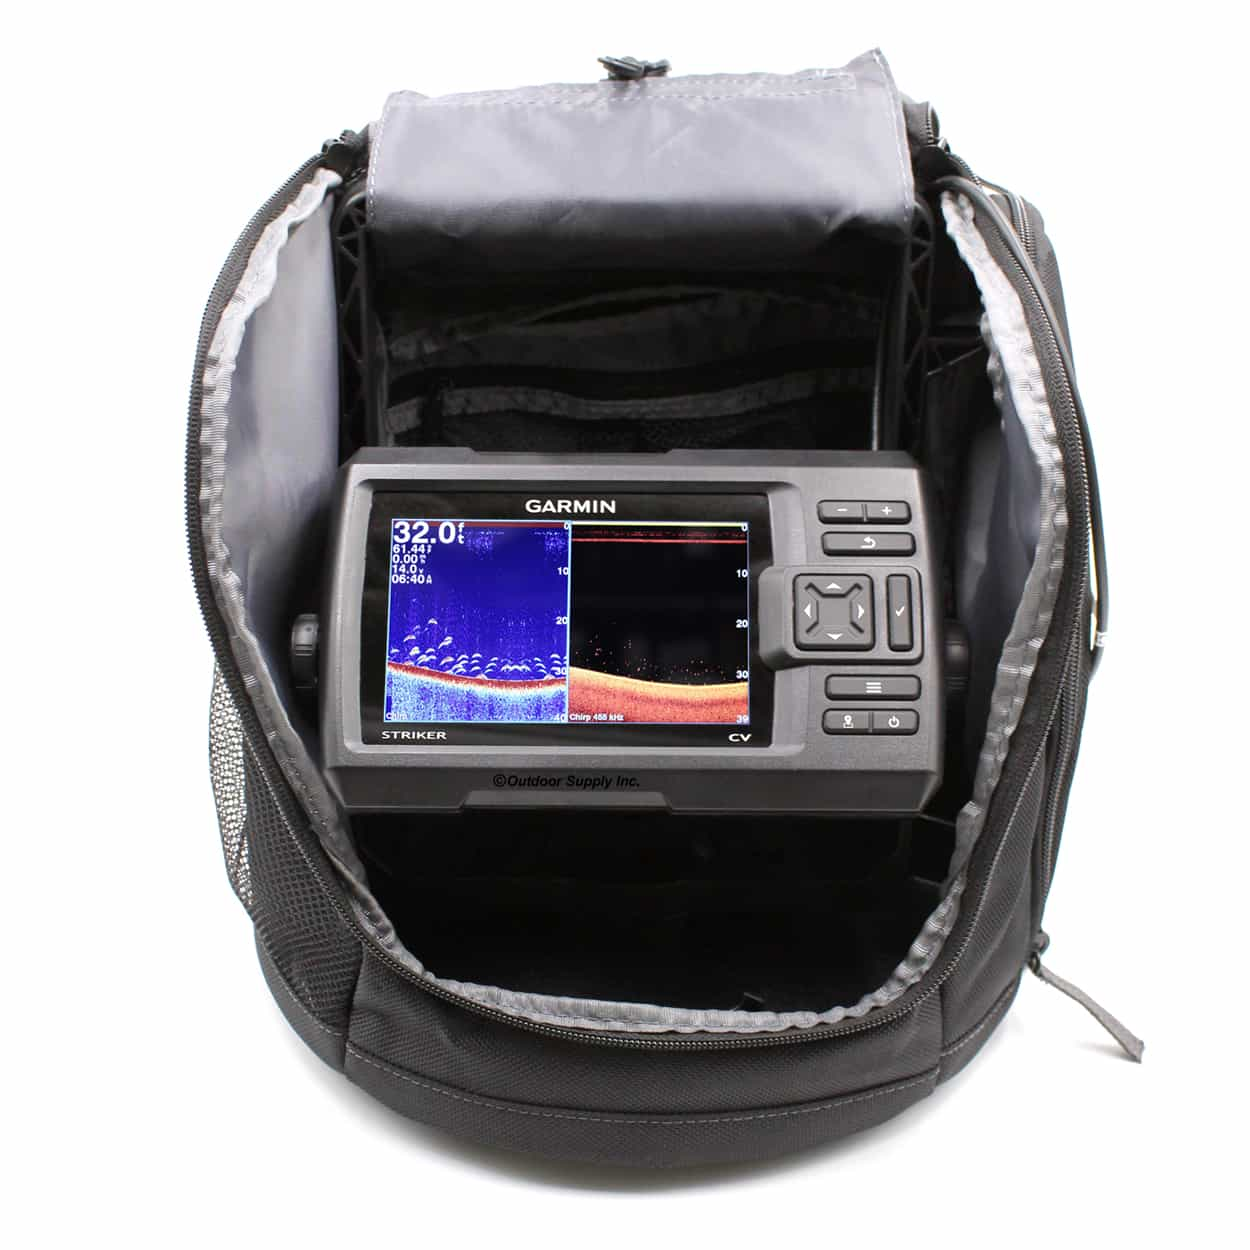 Striker plus 5cv portable fishfinder bundle outdoor for Garmin panoptix ice fishing